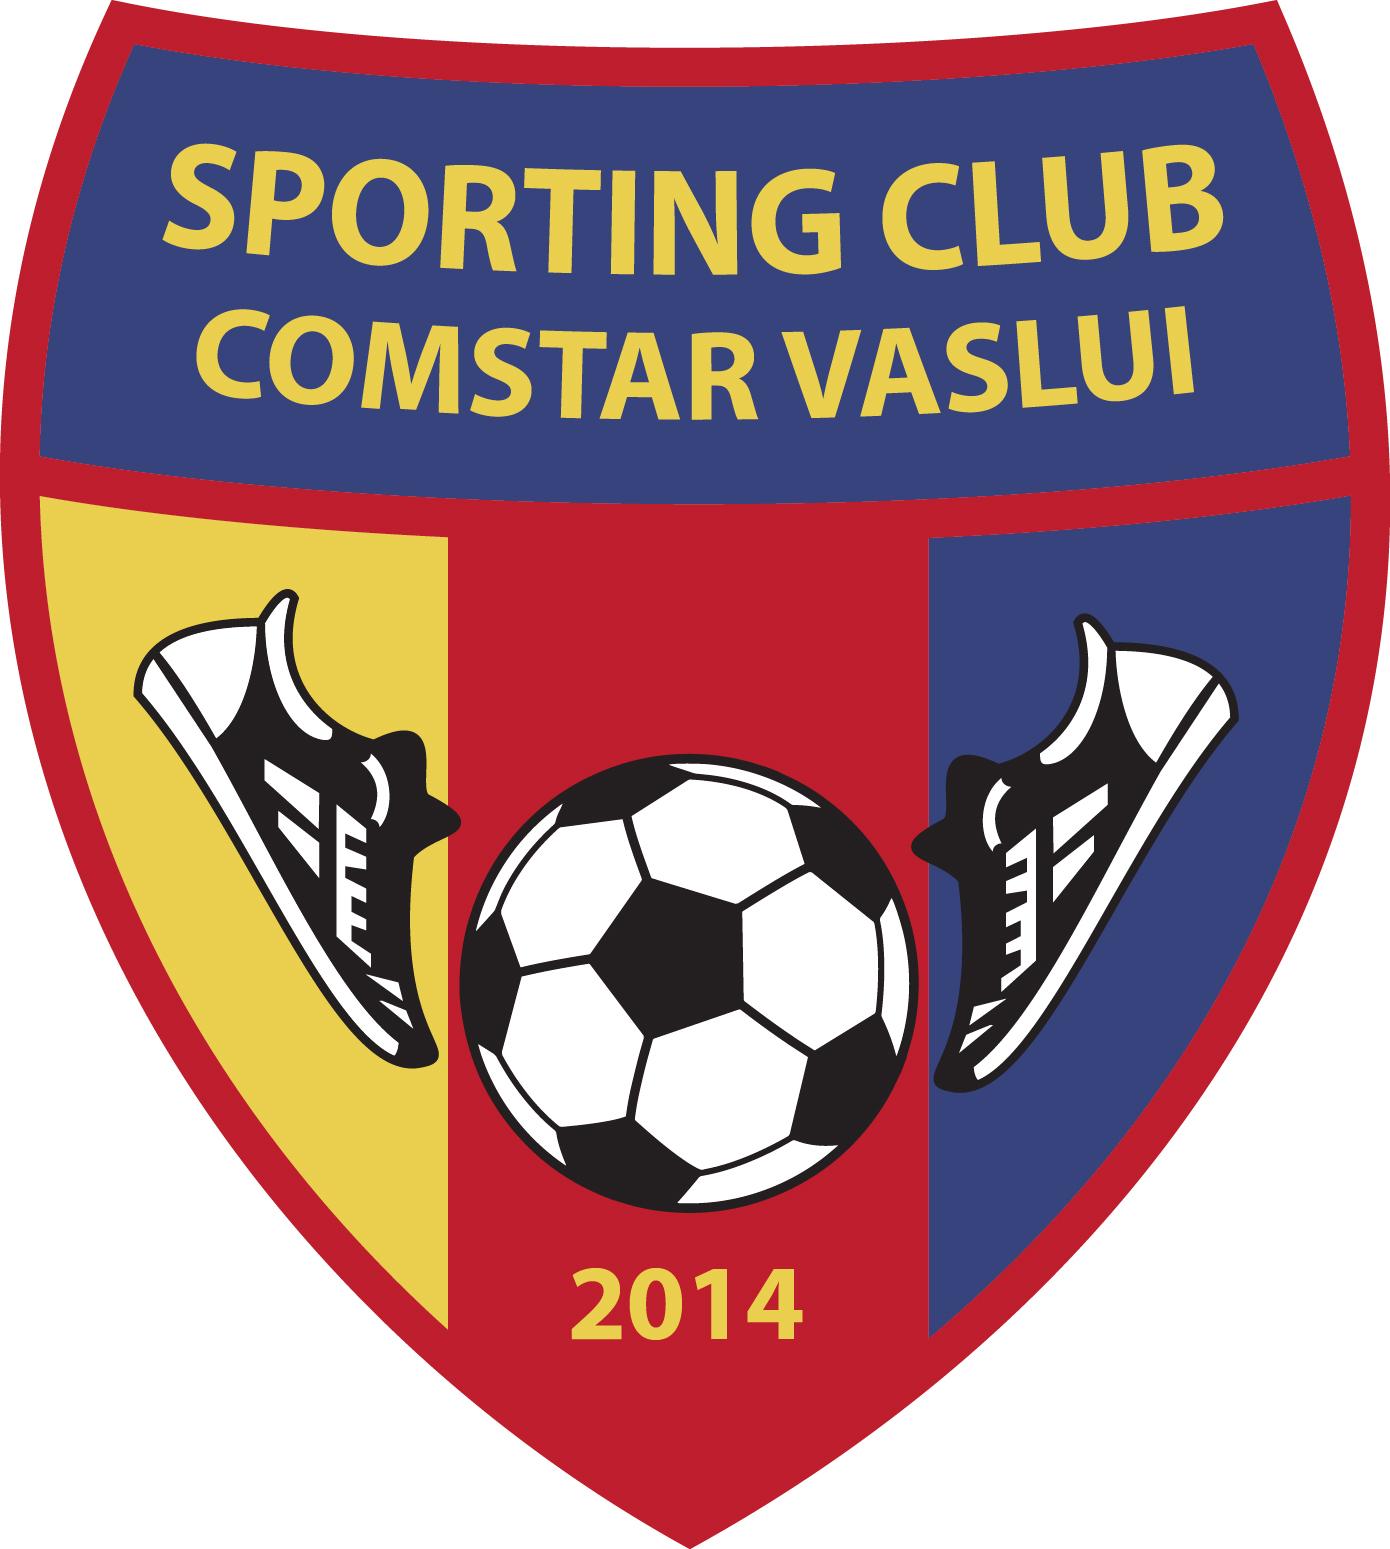 SPORTING CLUB COMSTAR  Vaslui